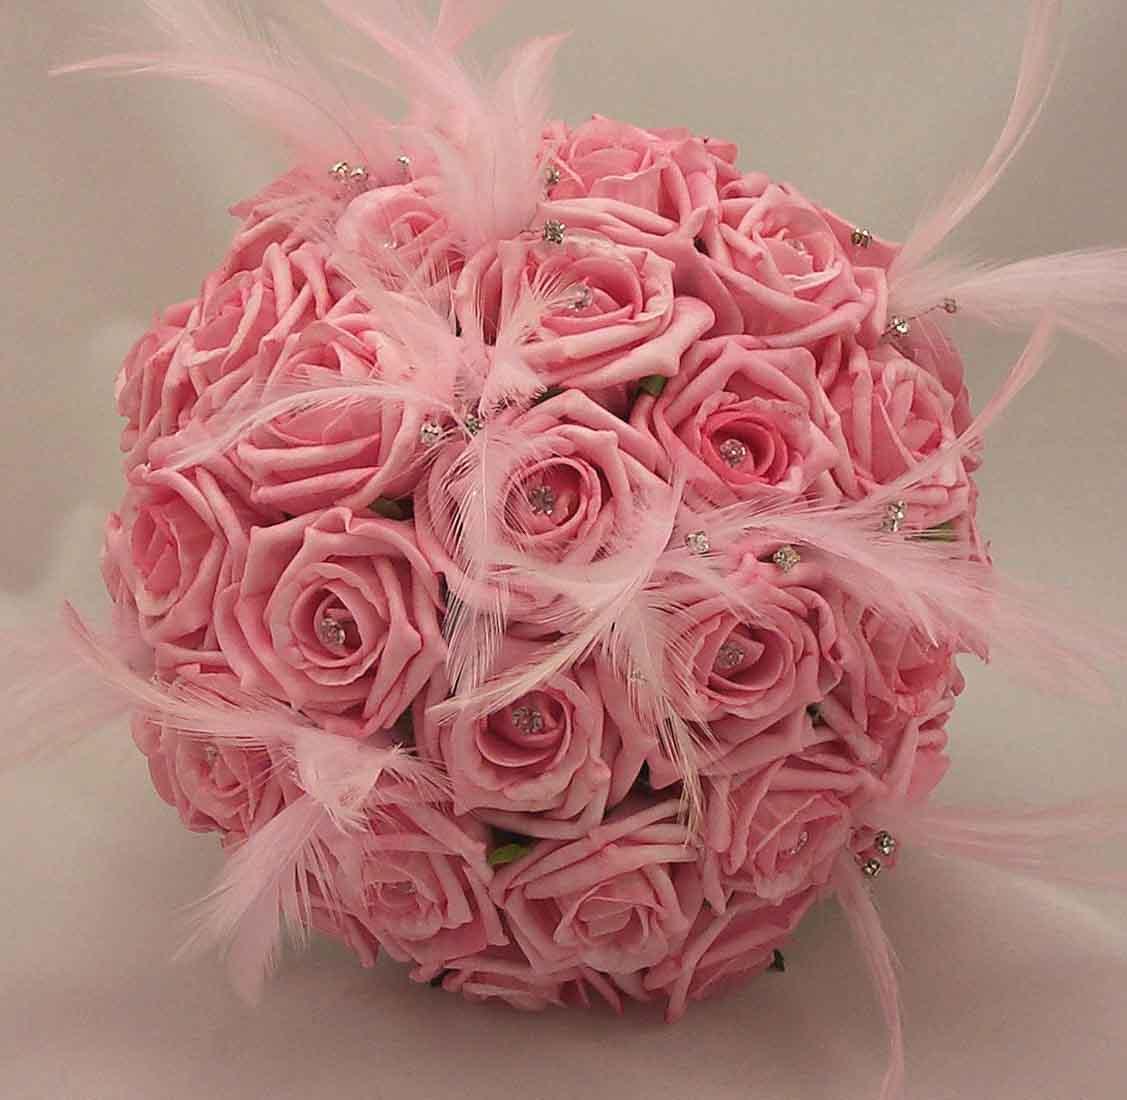 Beautifull Flowers 2011: wedding flowers pink